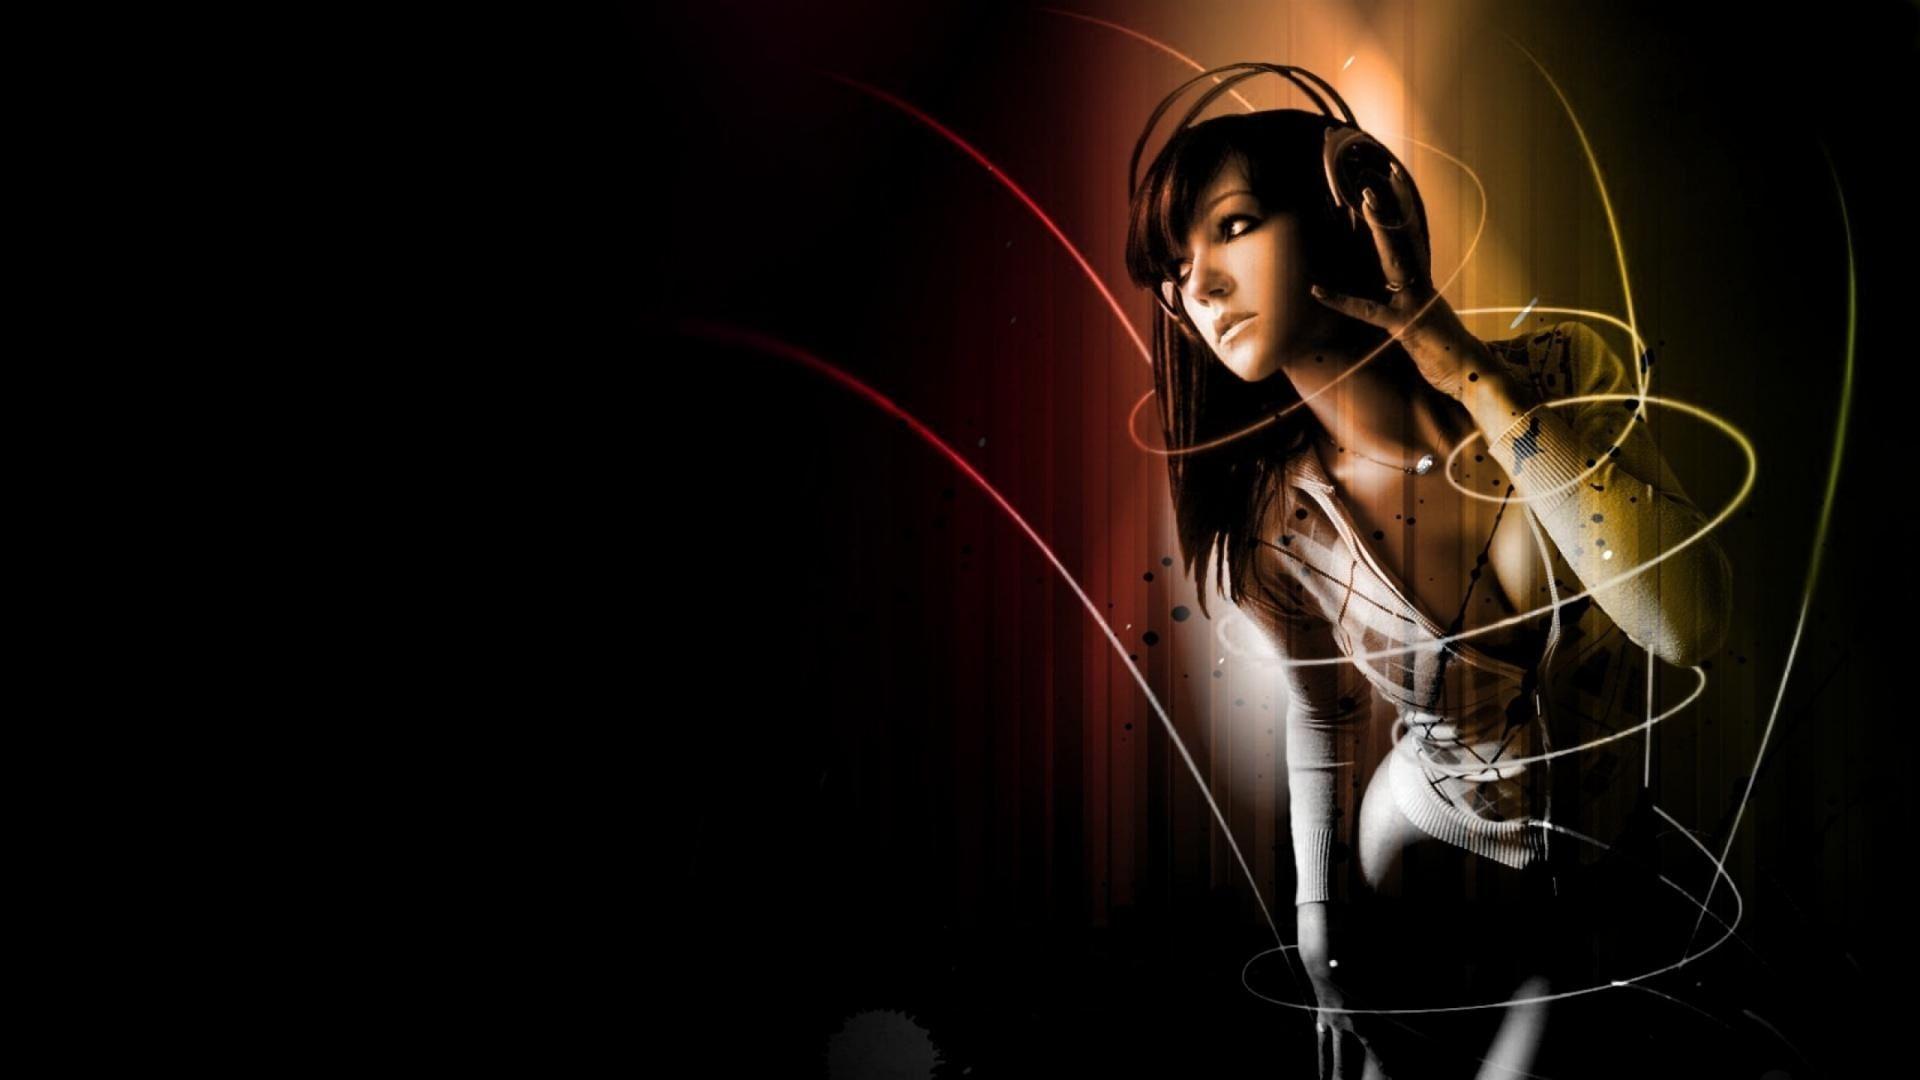 free hd i love music wallpapers downlaod 1020×765 love music